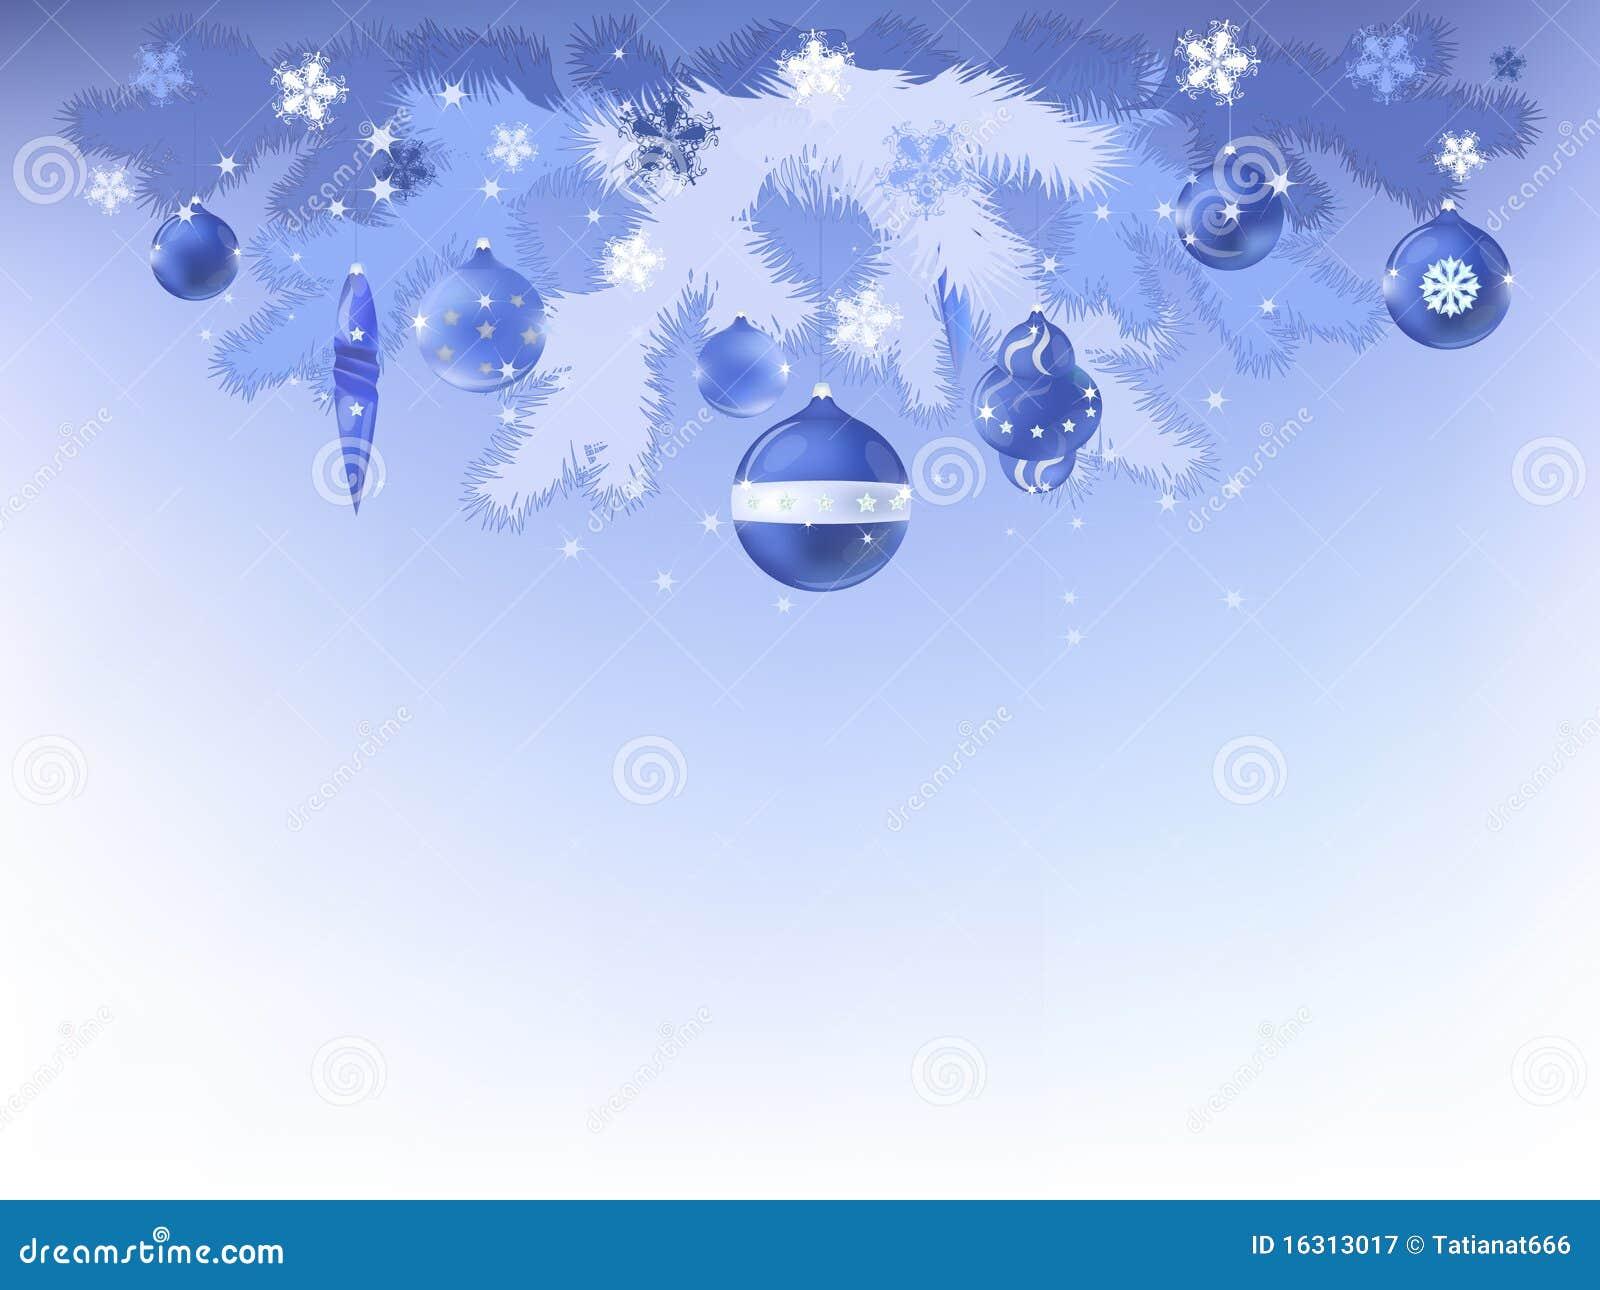 Decorative Christmas, New Year, Postcard Royalty Free Stock ...